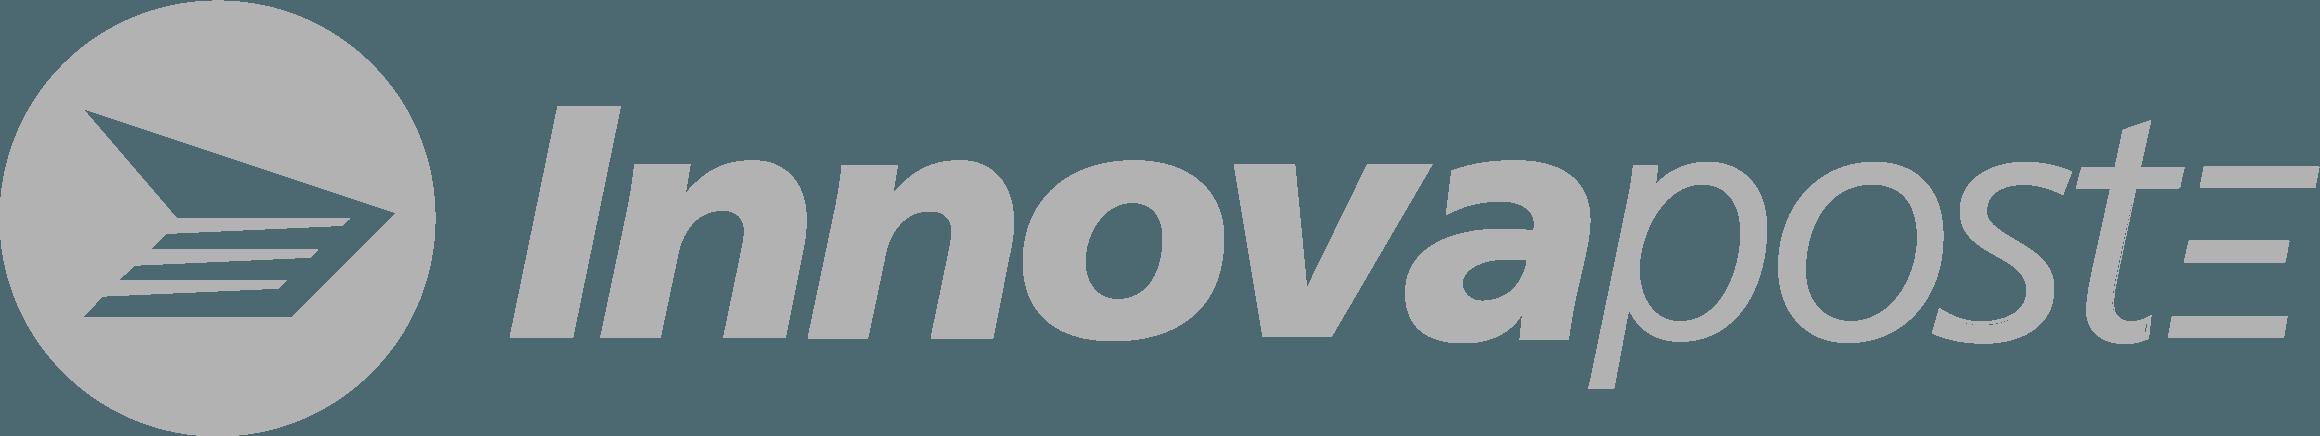 logo d'innovapost en gris